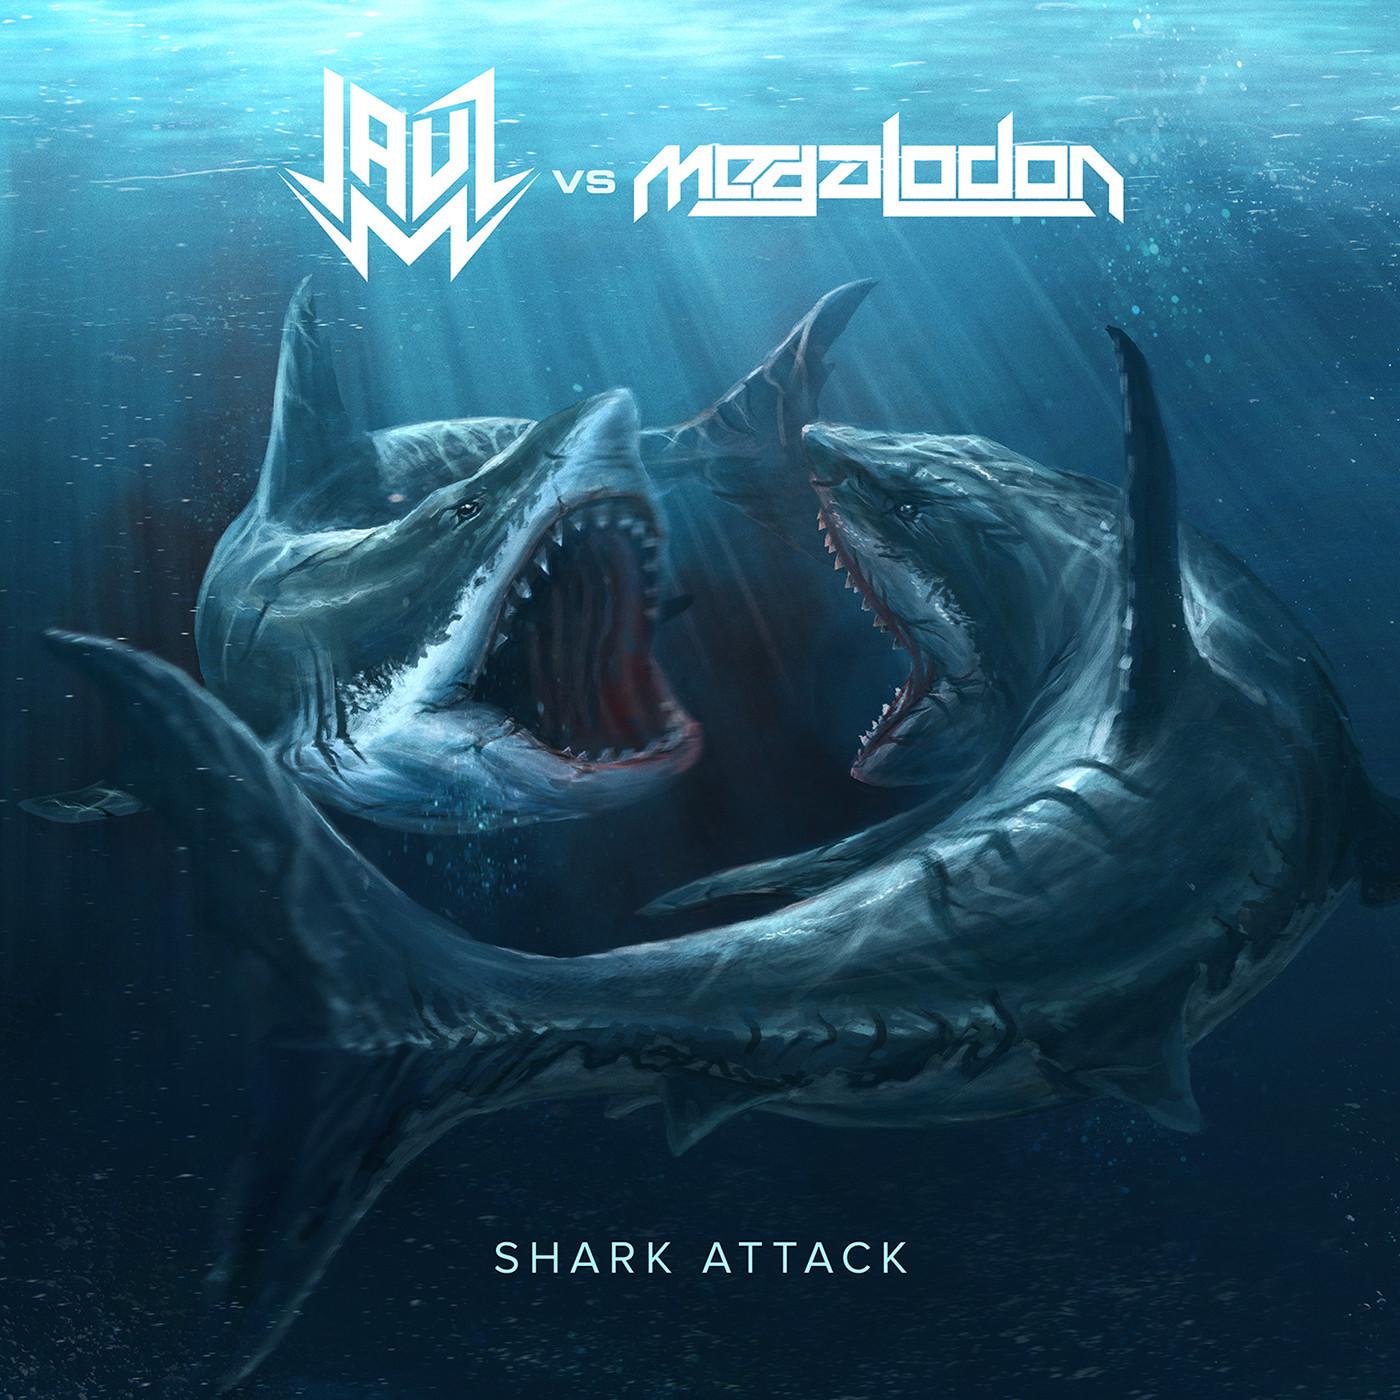 Eric hallquist jauz vs megalodon shark attack art 1400px